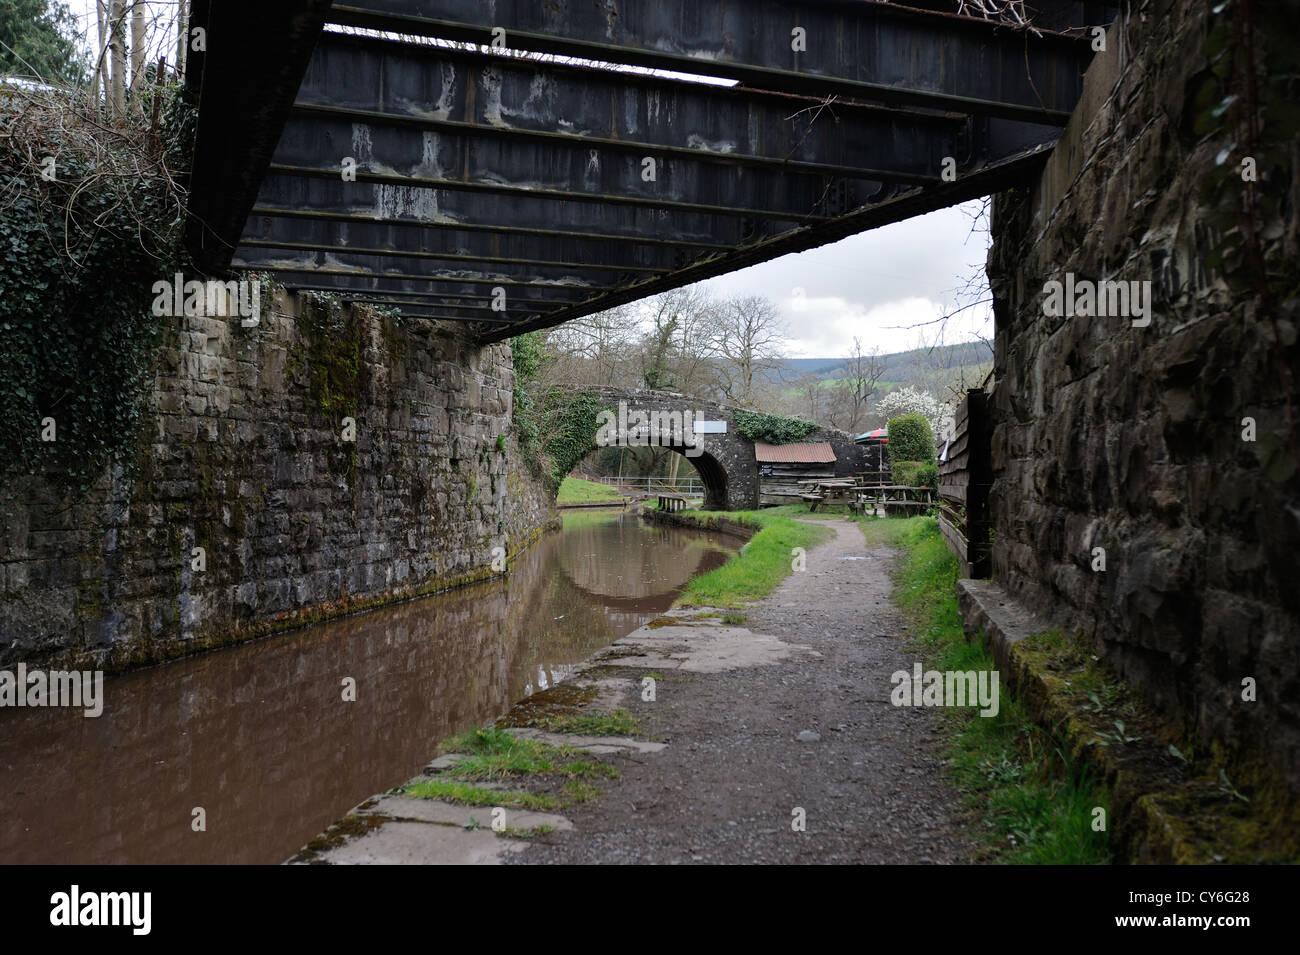 Talybont on usk canal bridges Stock Photo